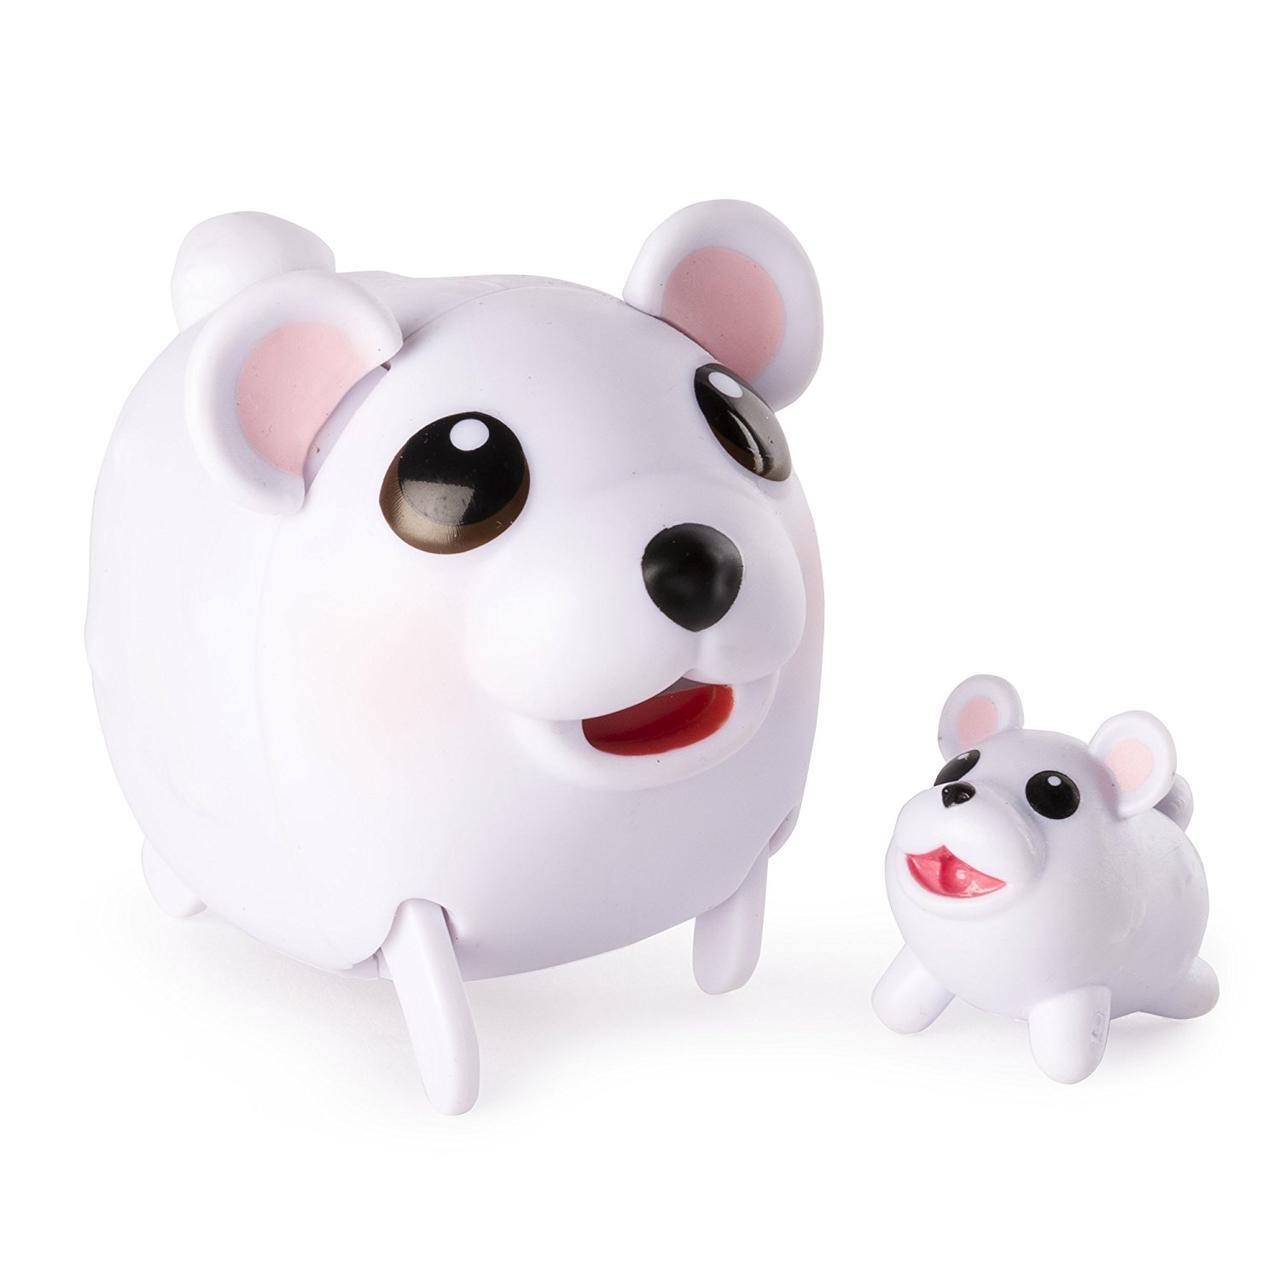 Spin Master Игровой набор Chubby Puppies из 2 фигурок - Полярные медведи